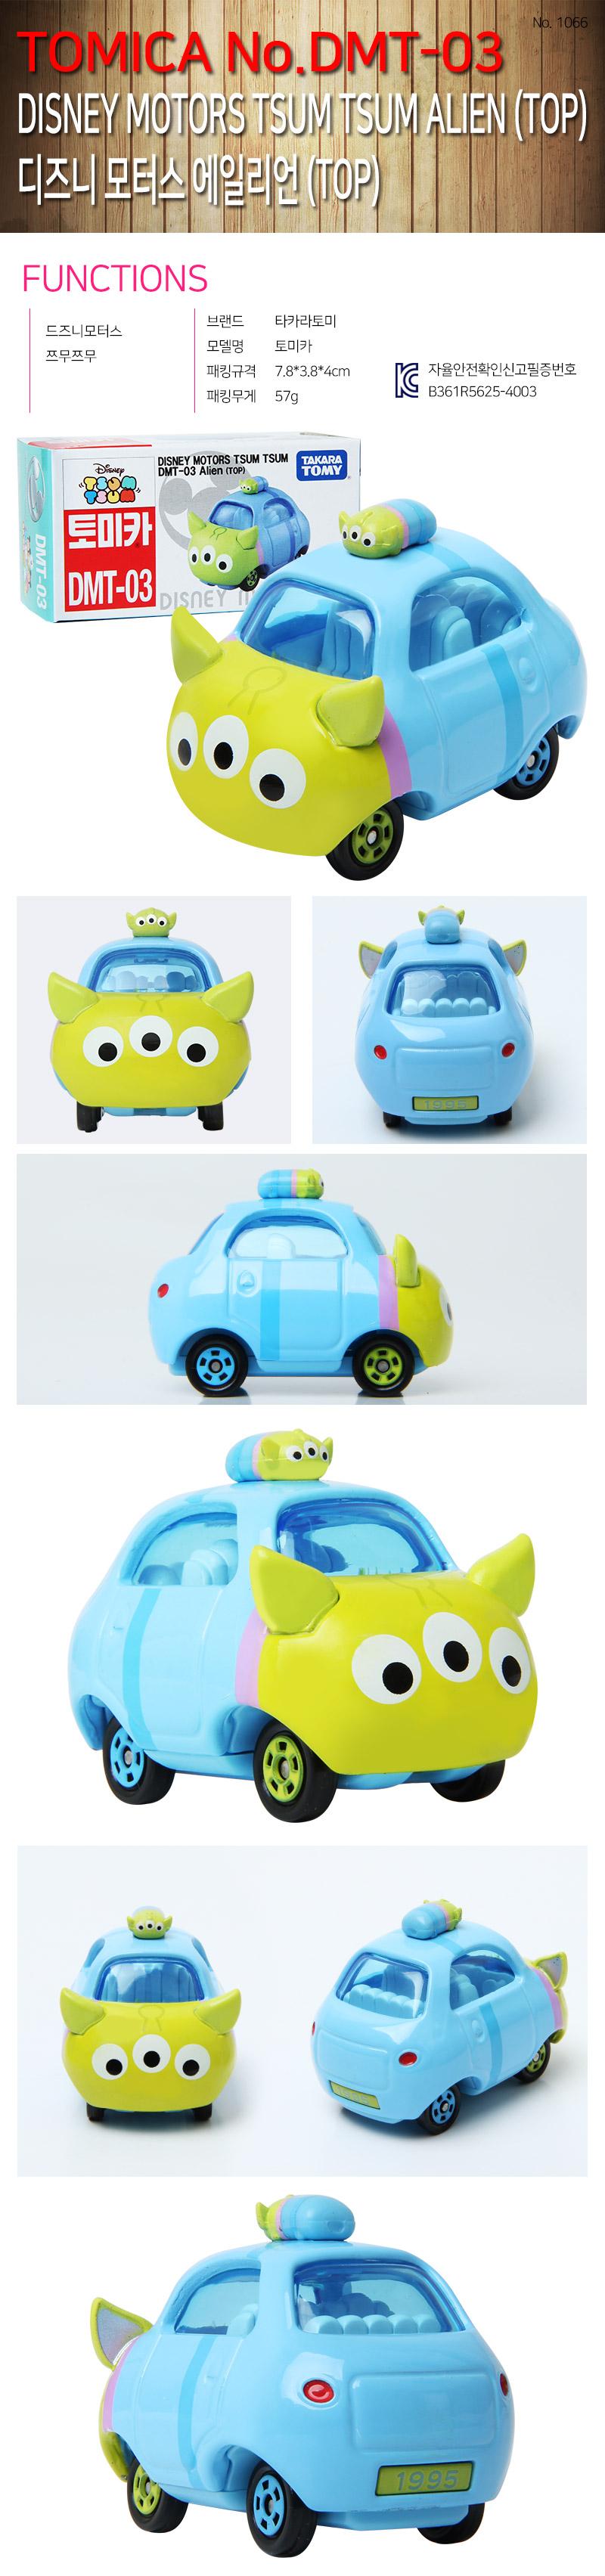 Olaf Takaratomy Tomica Disney Motors Tsum Tsum DMT-02 Mini Car Figure with Top